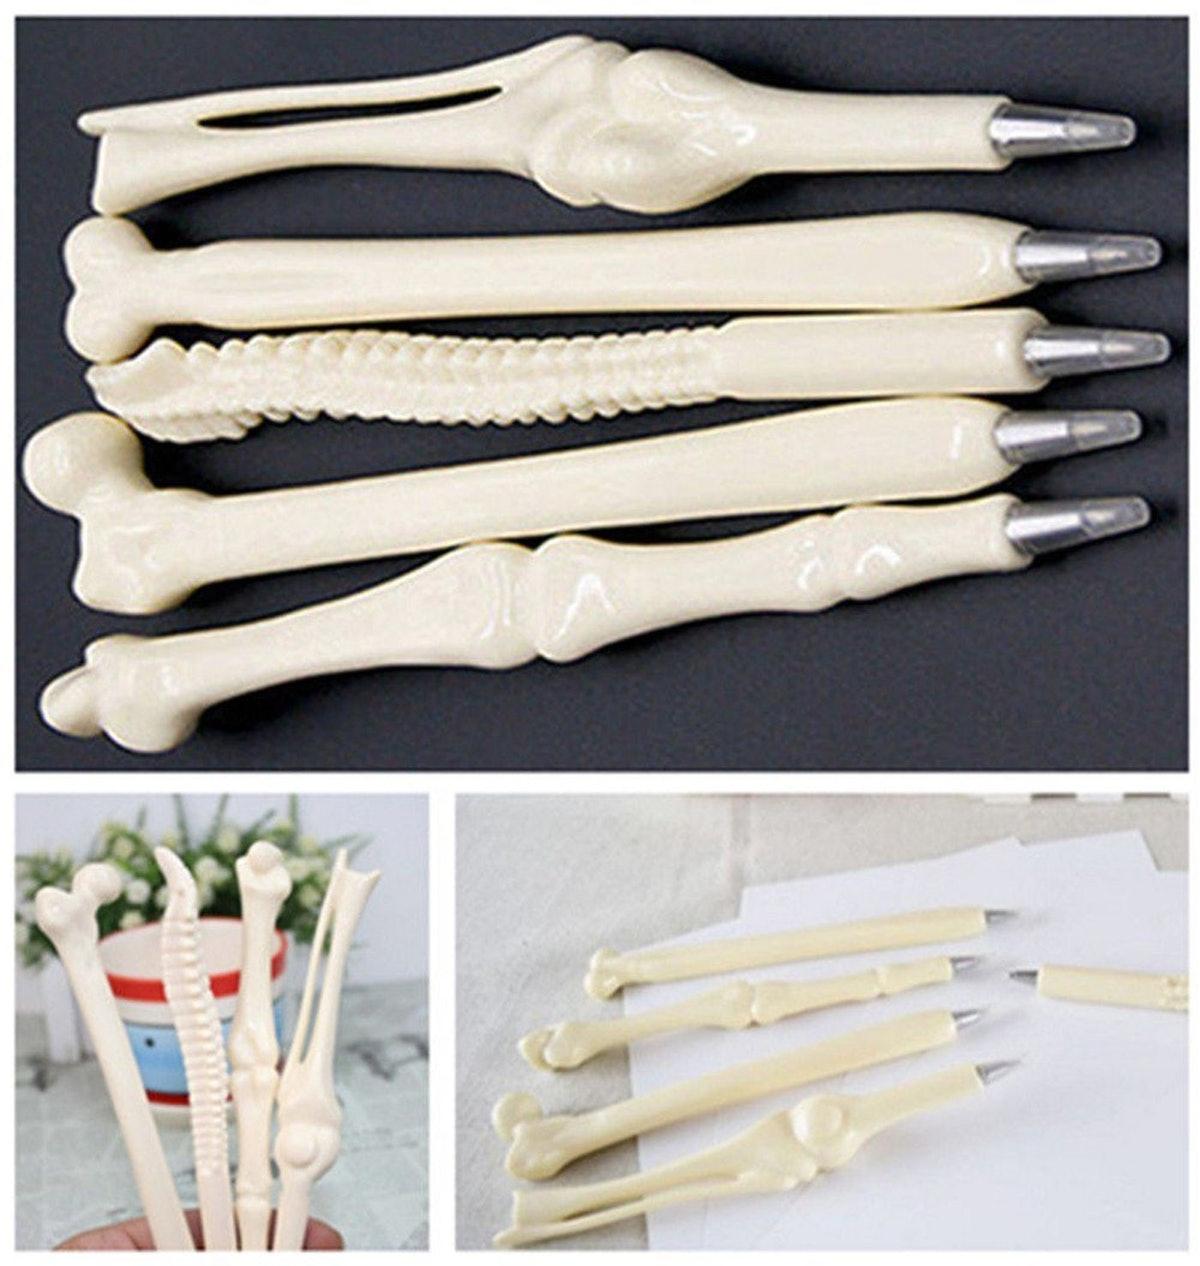 MXXGMYJ Bone-Shaped Pens (10 Pack)